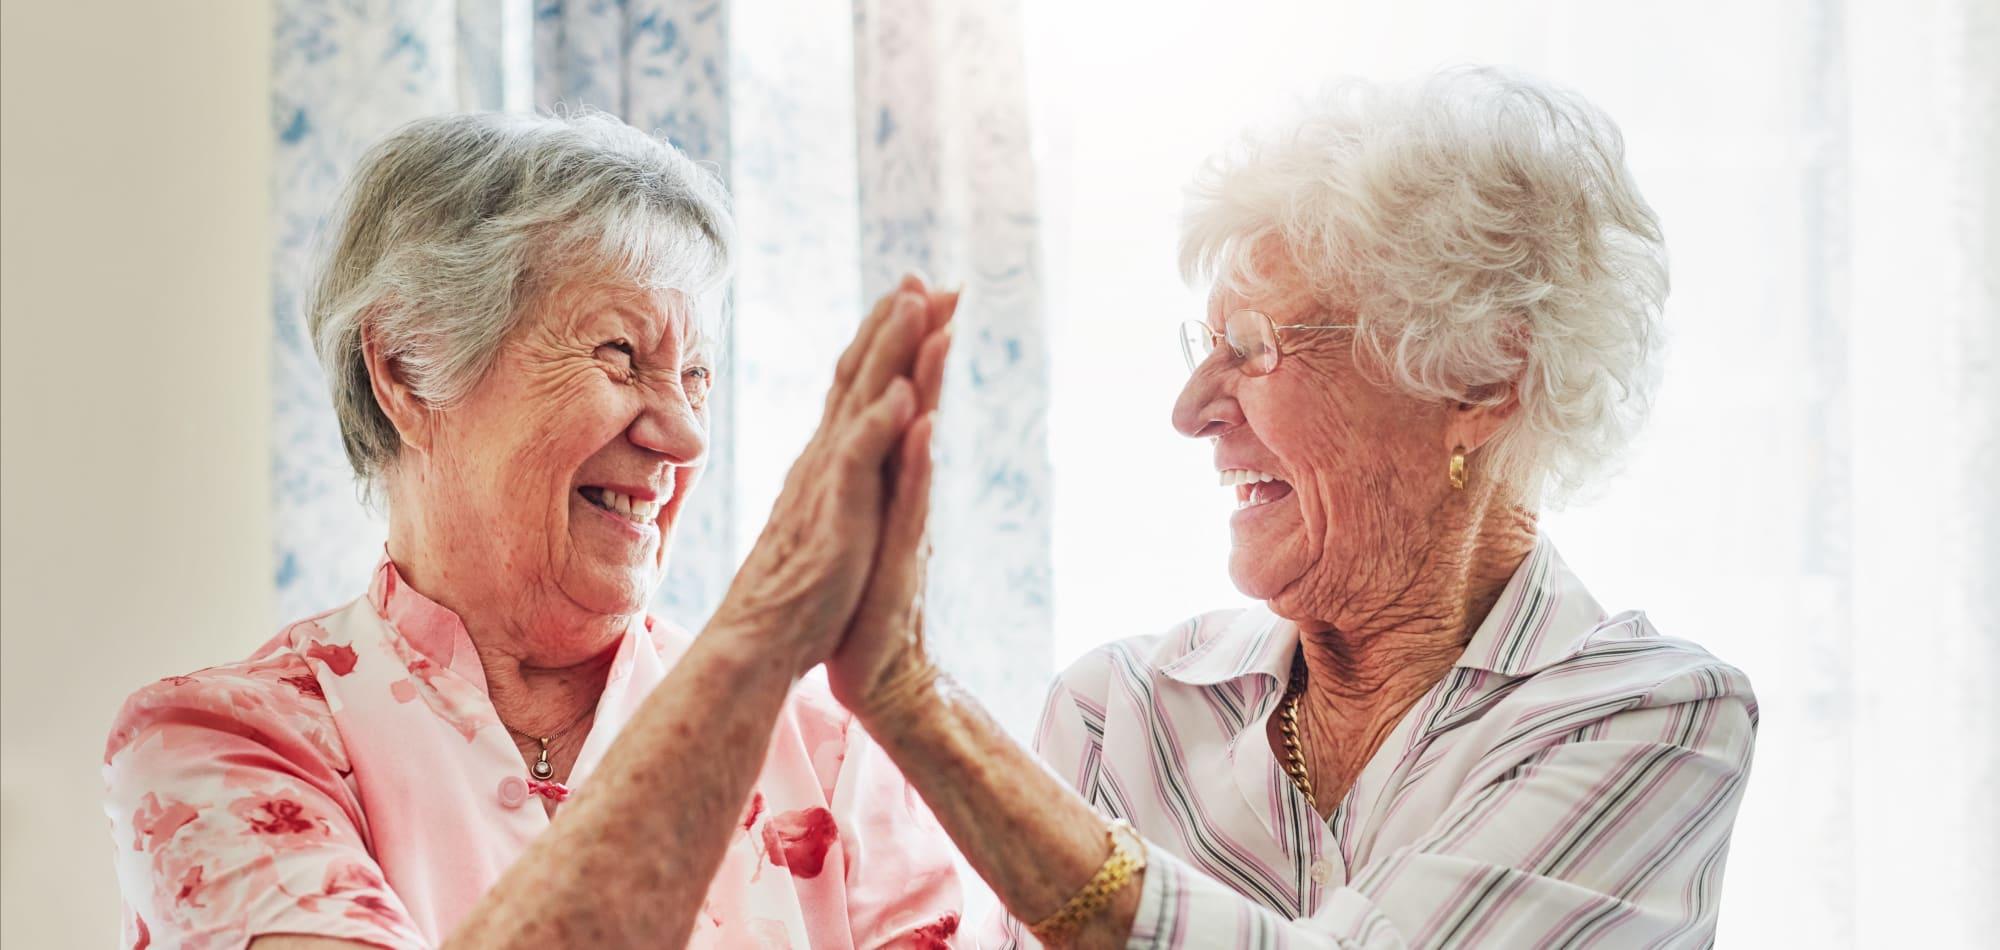 Respite care at Milestone Senior Living in Eau Claire, Wisconsin.